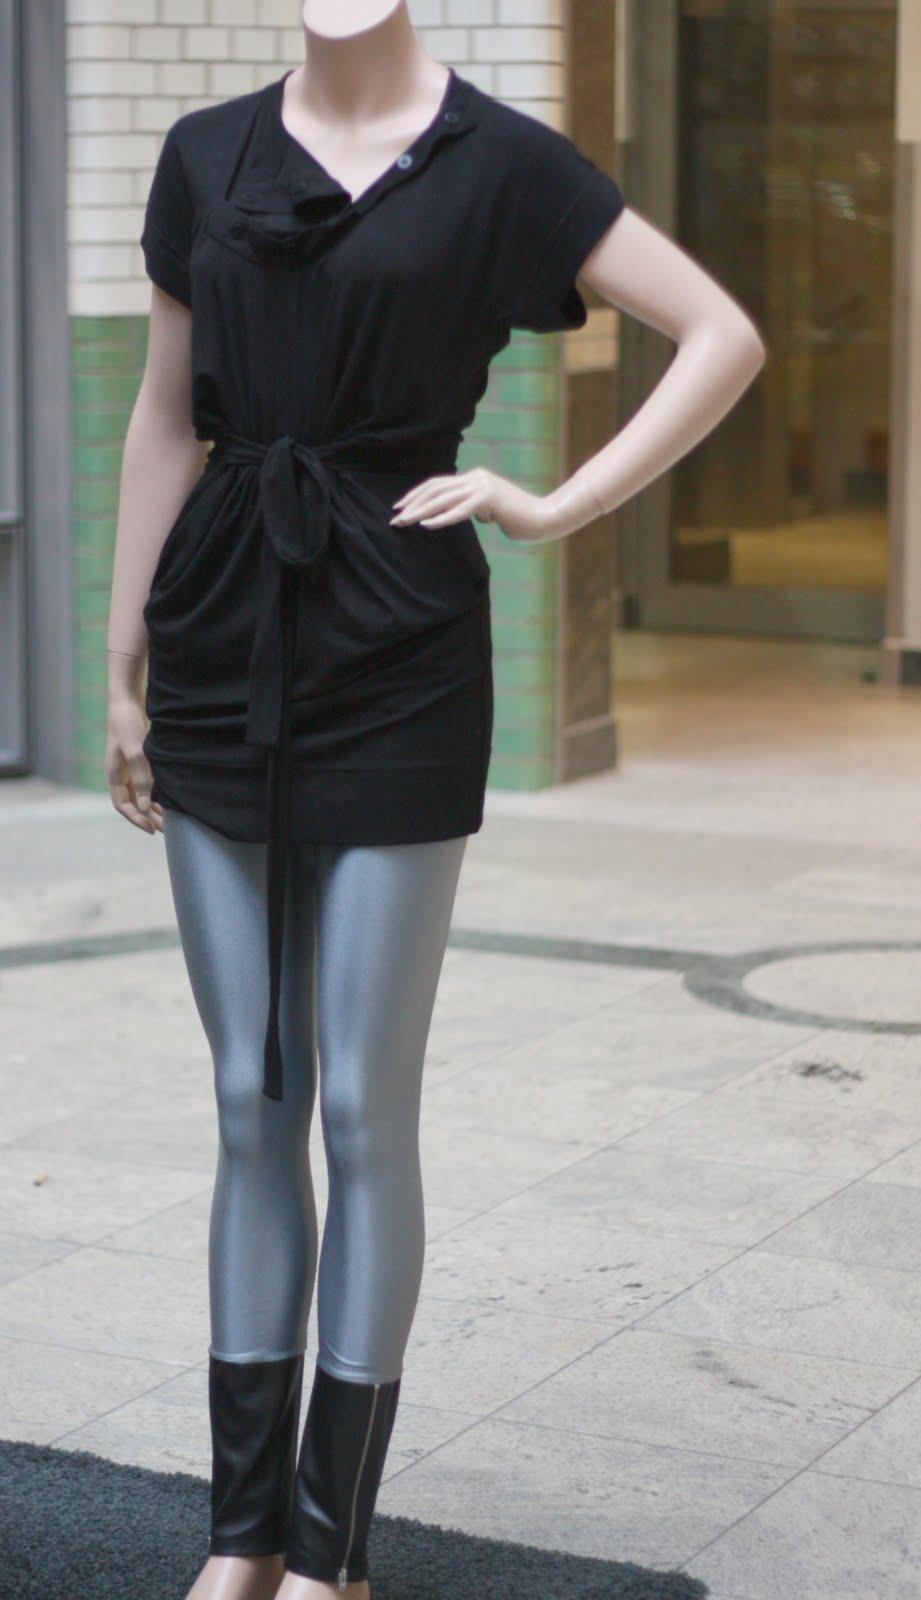 fashion style art design music events mannequins outfit. Black Bedroom Furniture Sets. Home Design Ideas